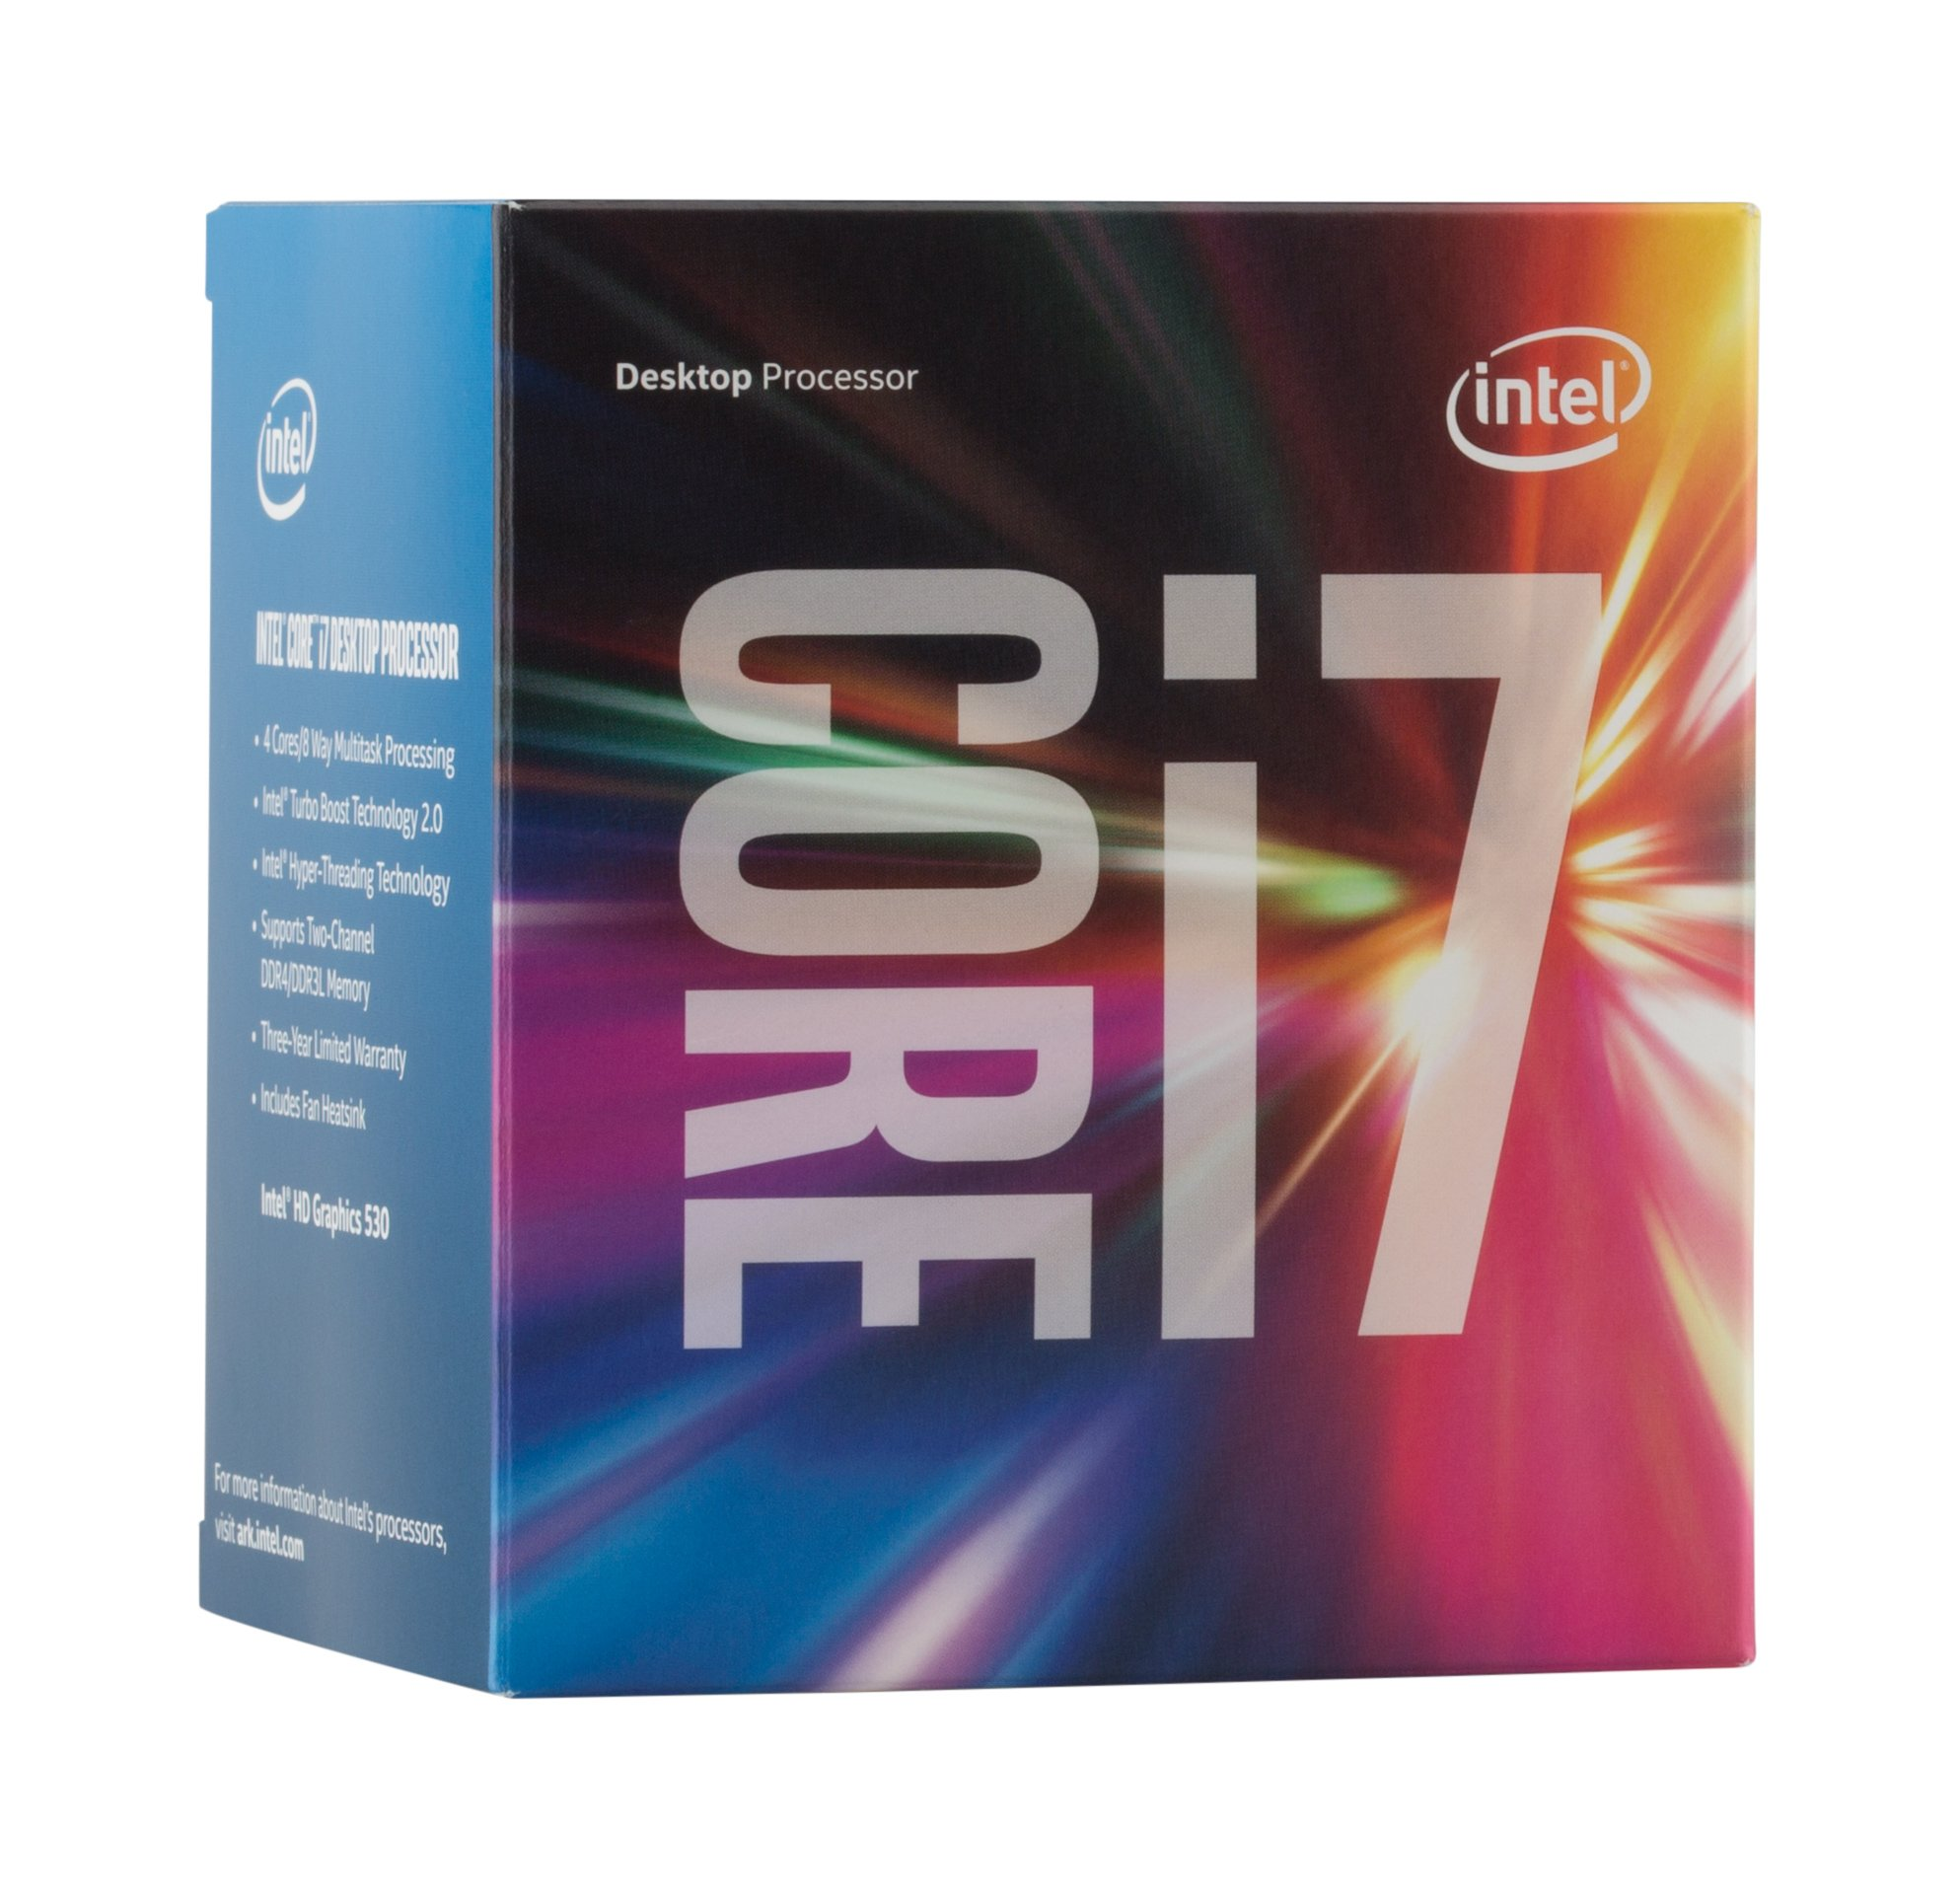 Intel Boxed Core I7-6700 FC-LGA14C 3.40 GHz 8 M Processor Cache 4 LGA 1151 BX80662I76700 by Intel